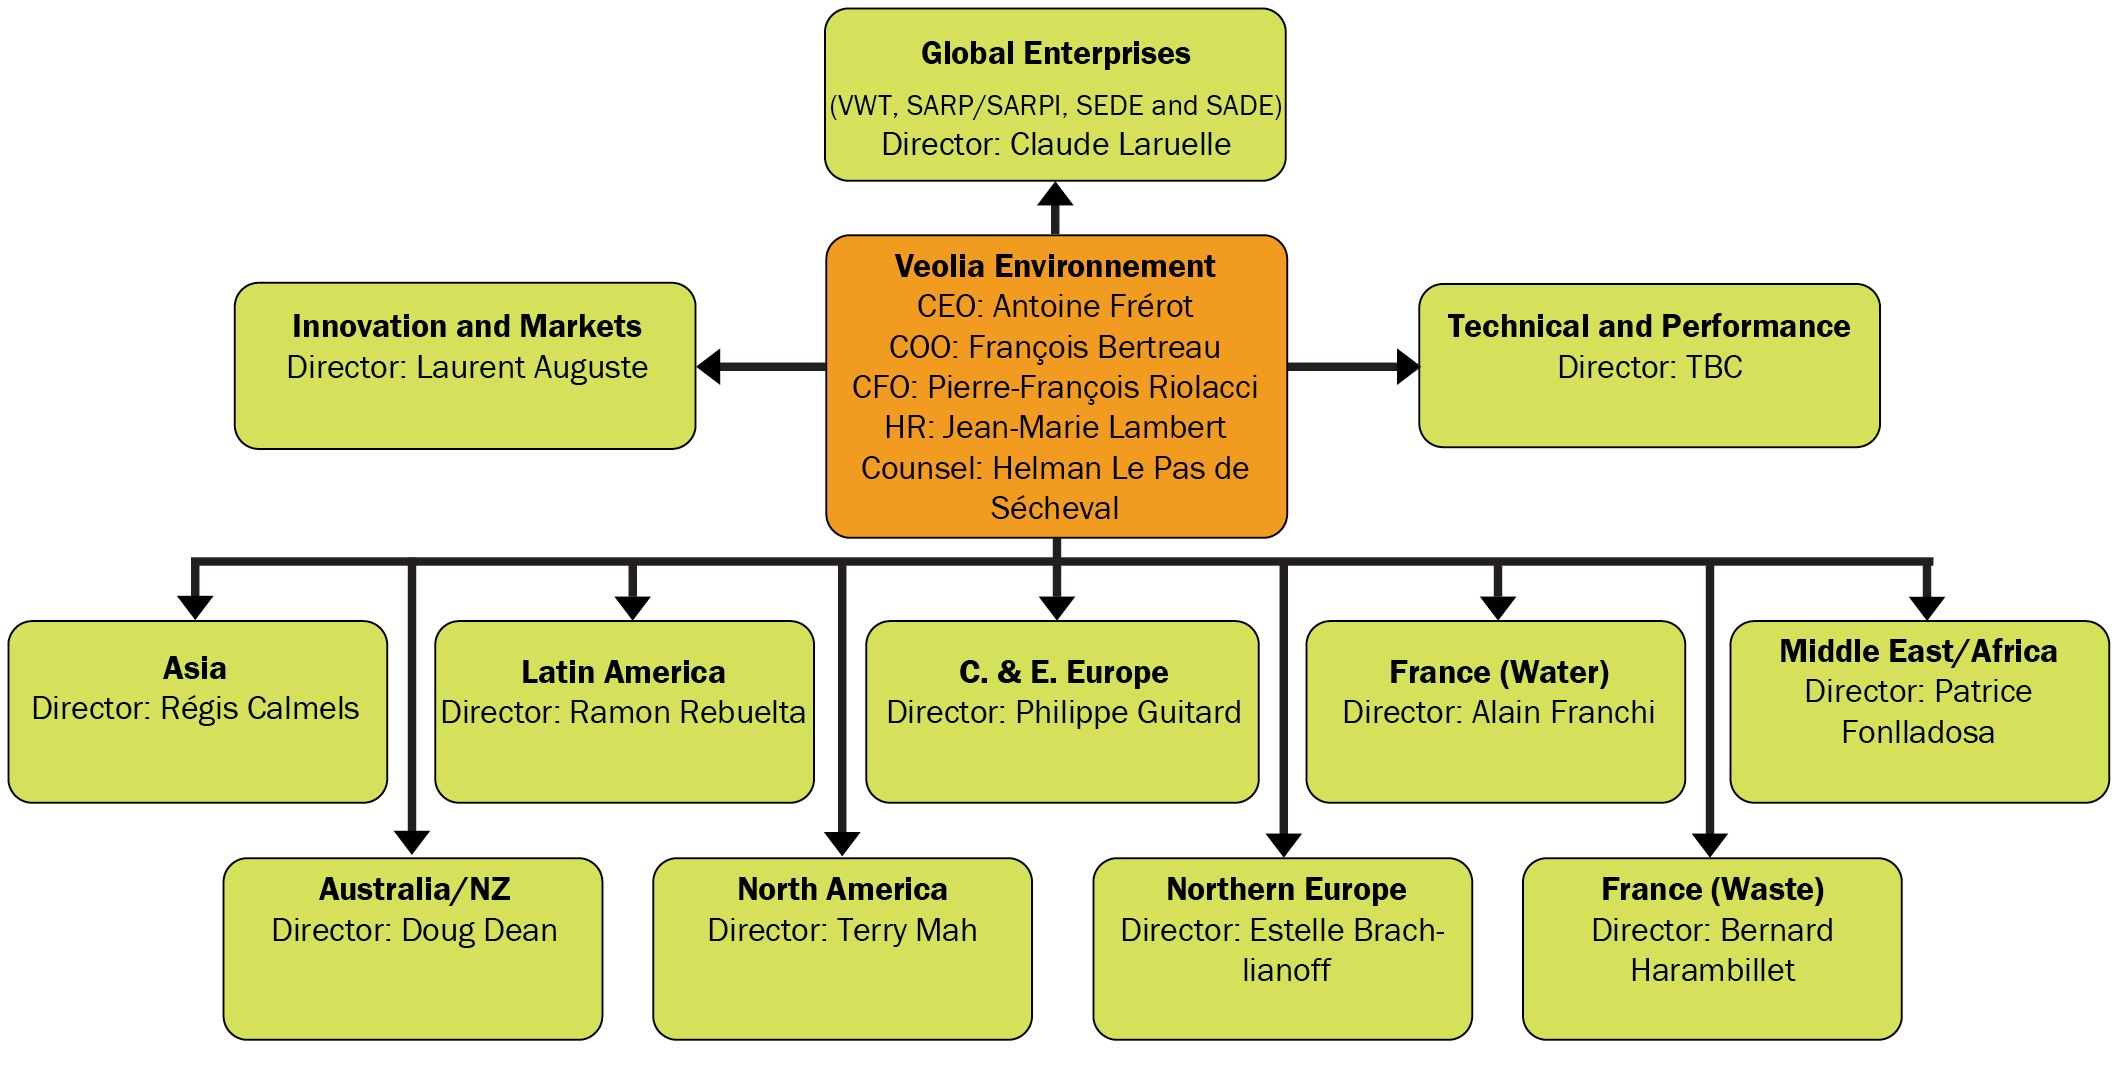 Vie new org chart